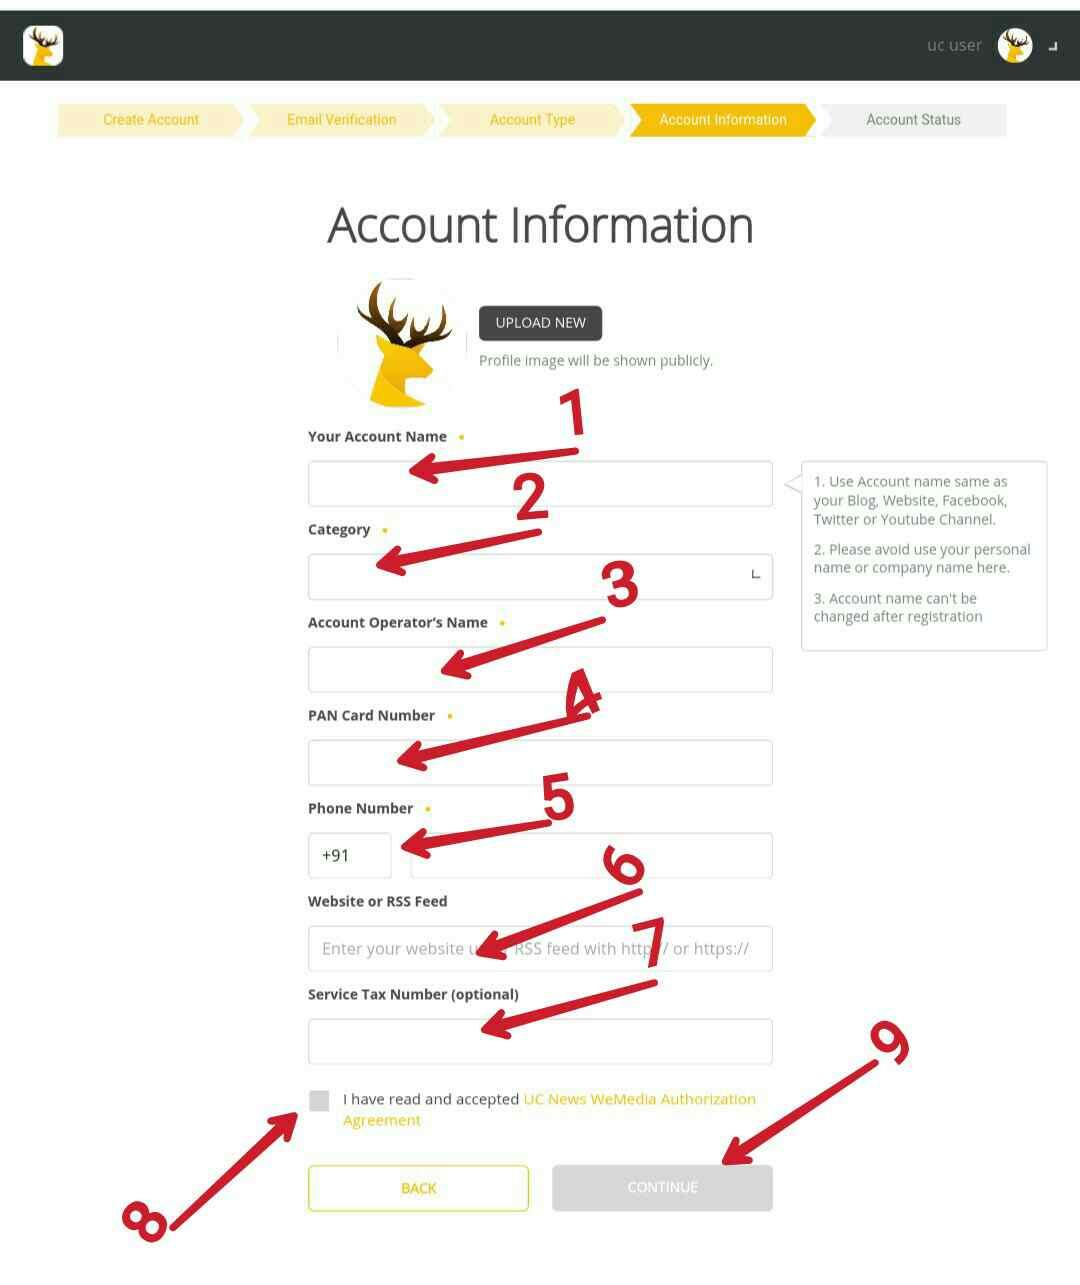 Uc news account information, UC news par account kaise banaye puri jankari hindi me